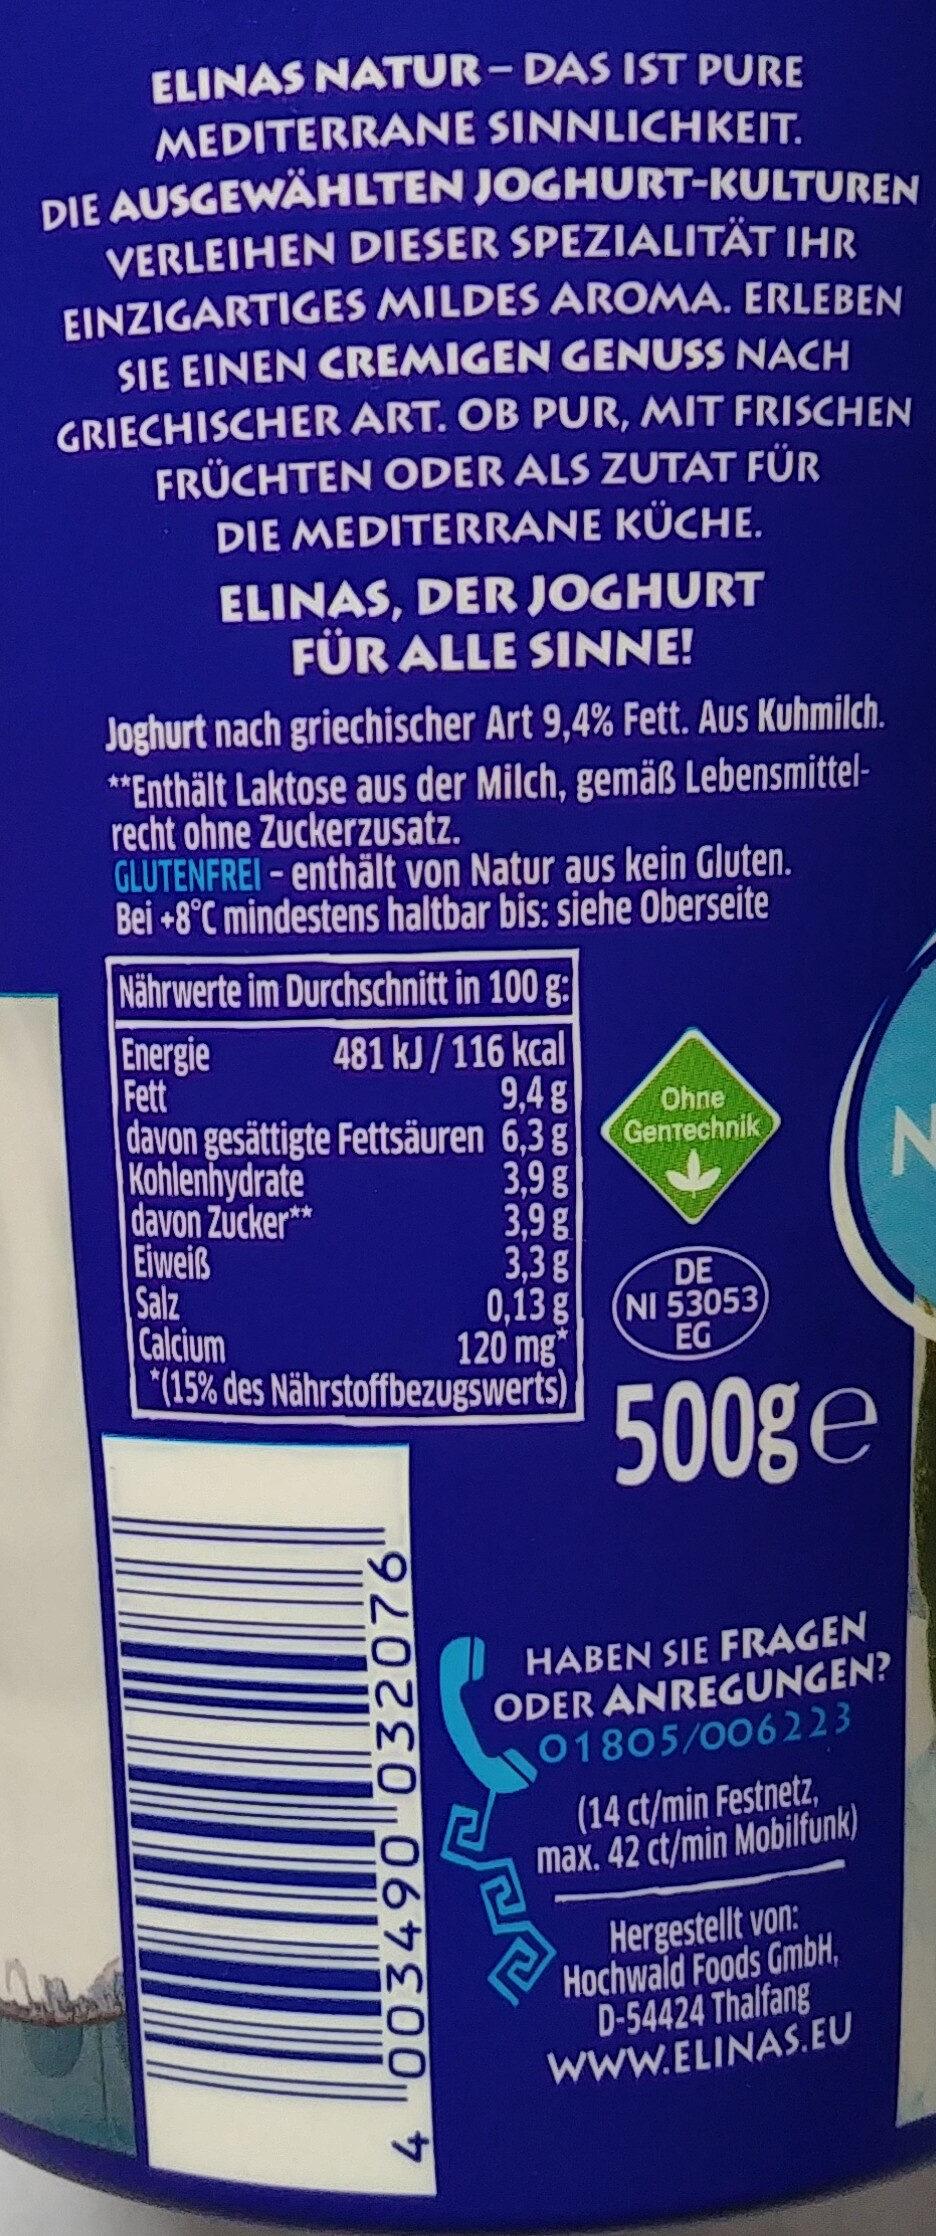 Elinas Griechischer Joghurt Natur, 500 g - Zutaten - de